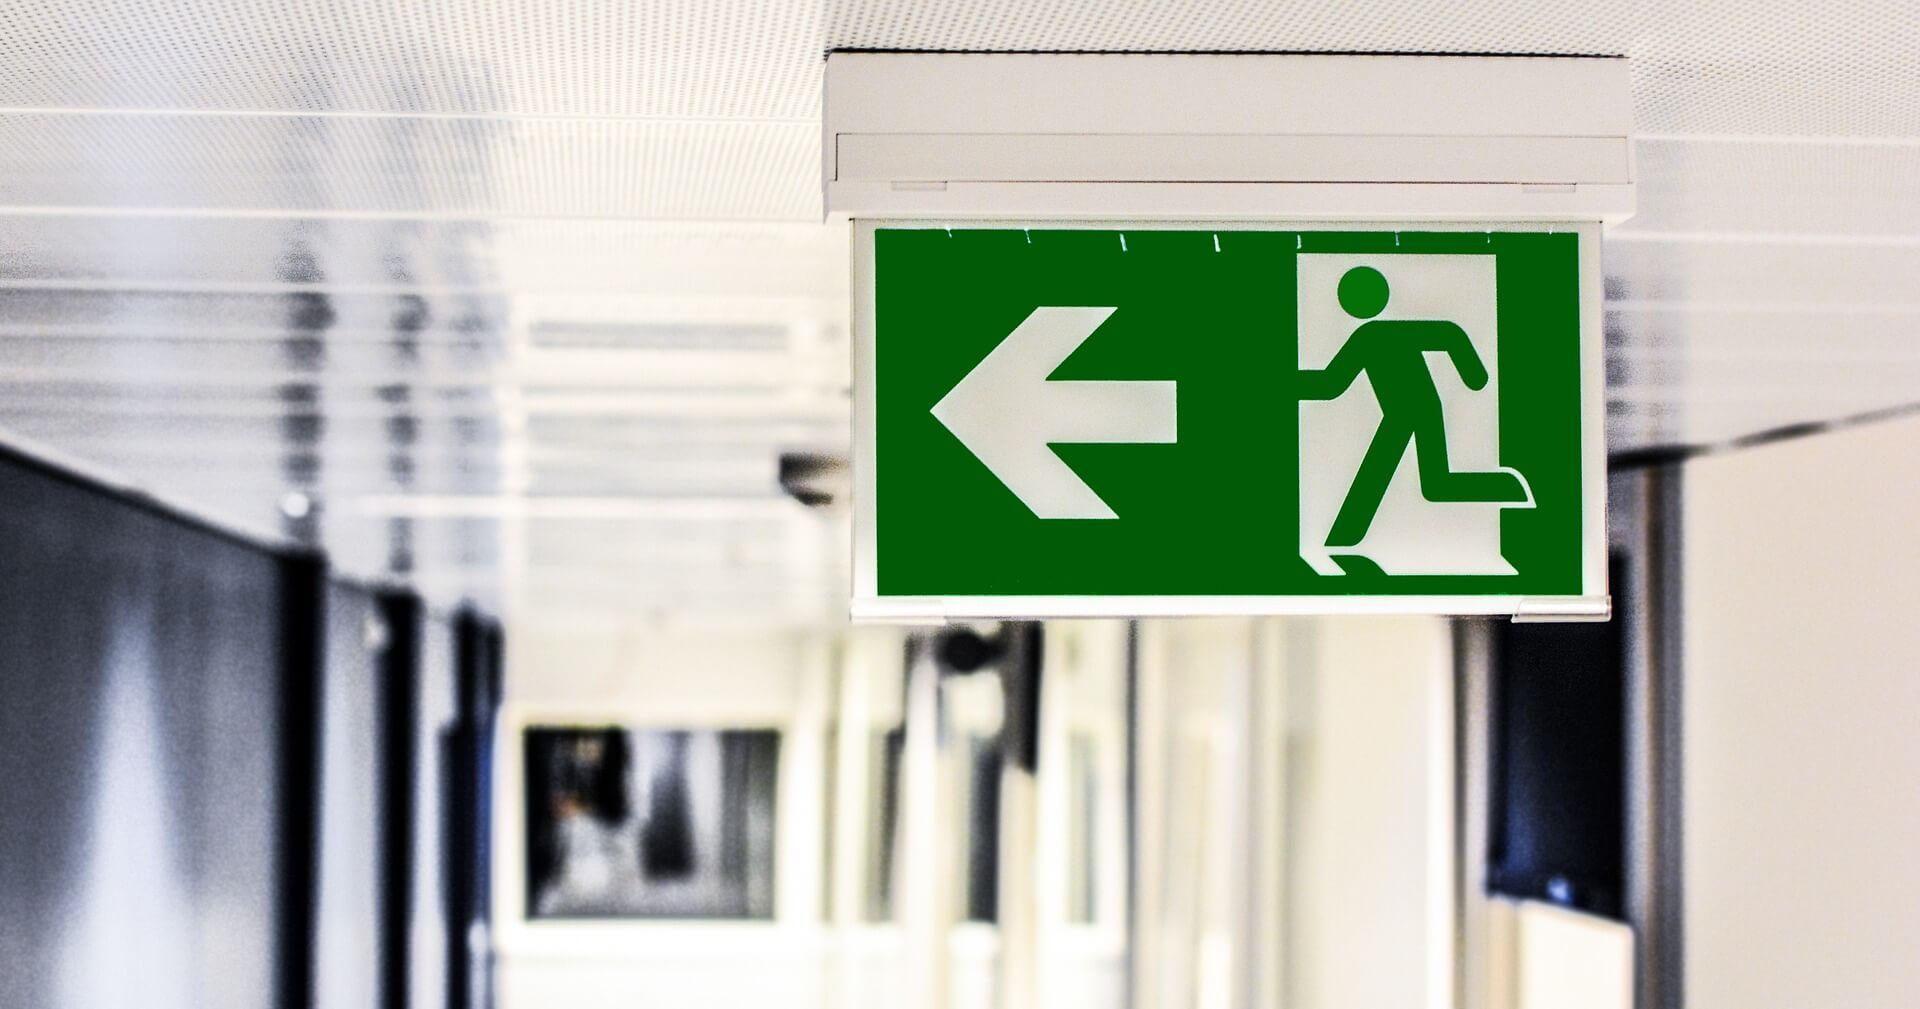 emergency-exit-1321134_1920 店舗改修をお考えの方必見!消防法や消防検査についてご紹介します!